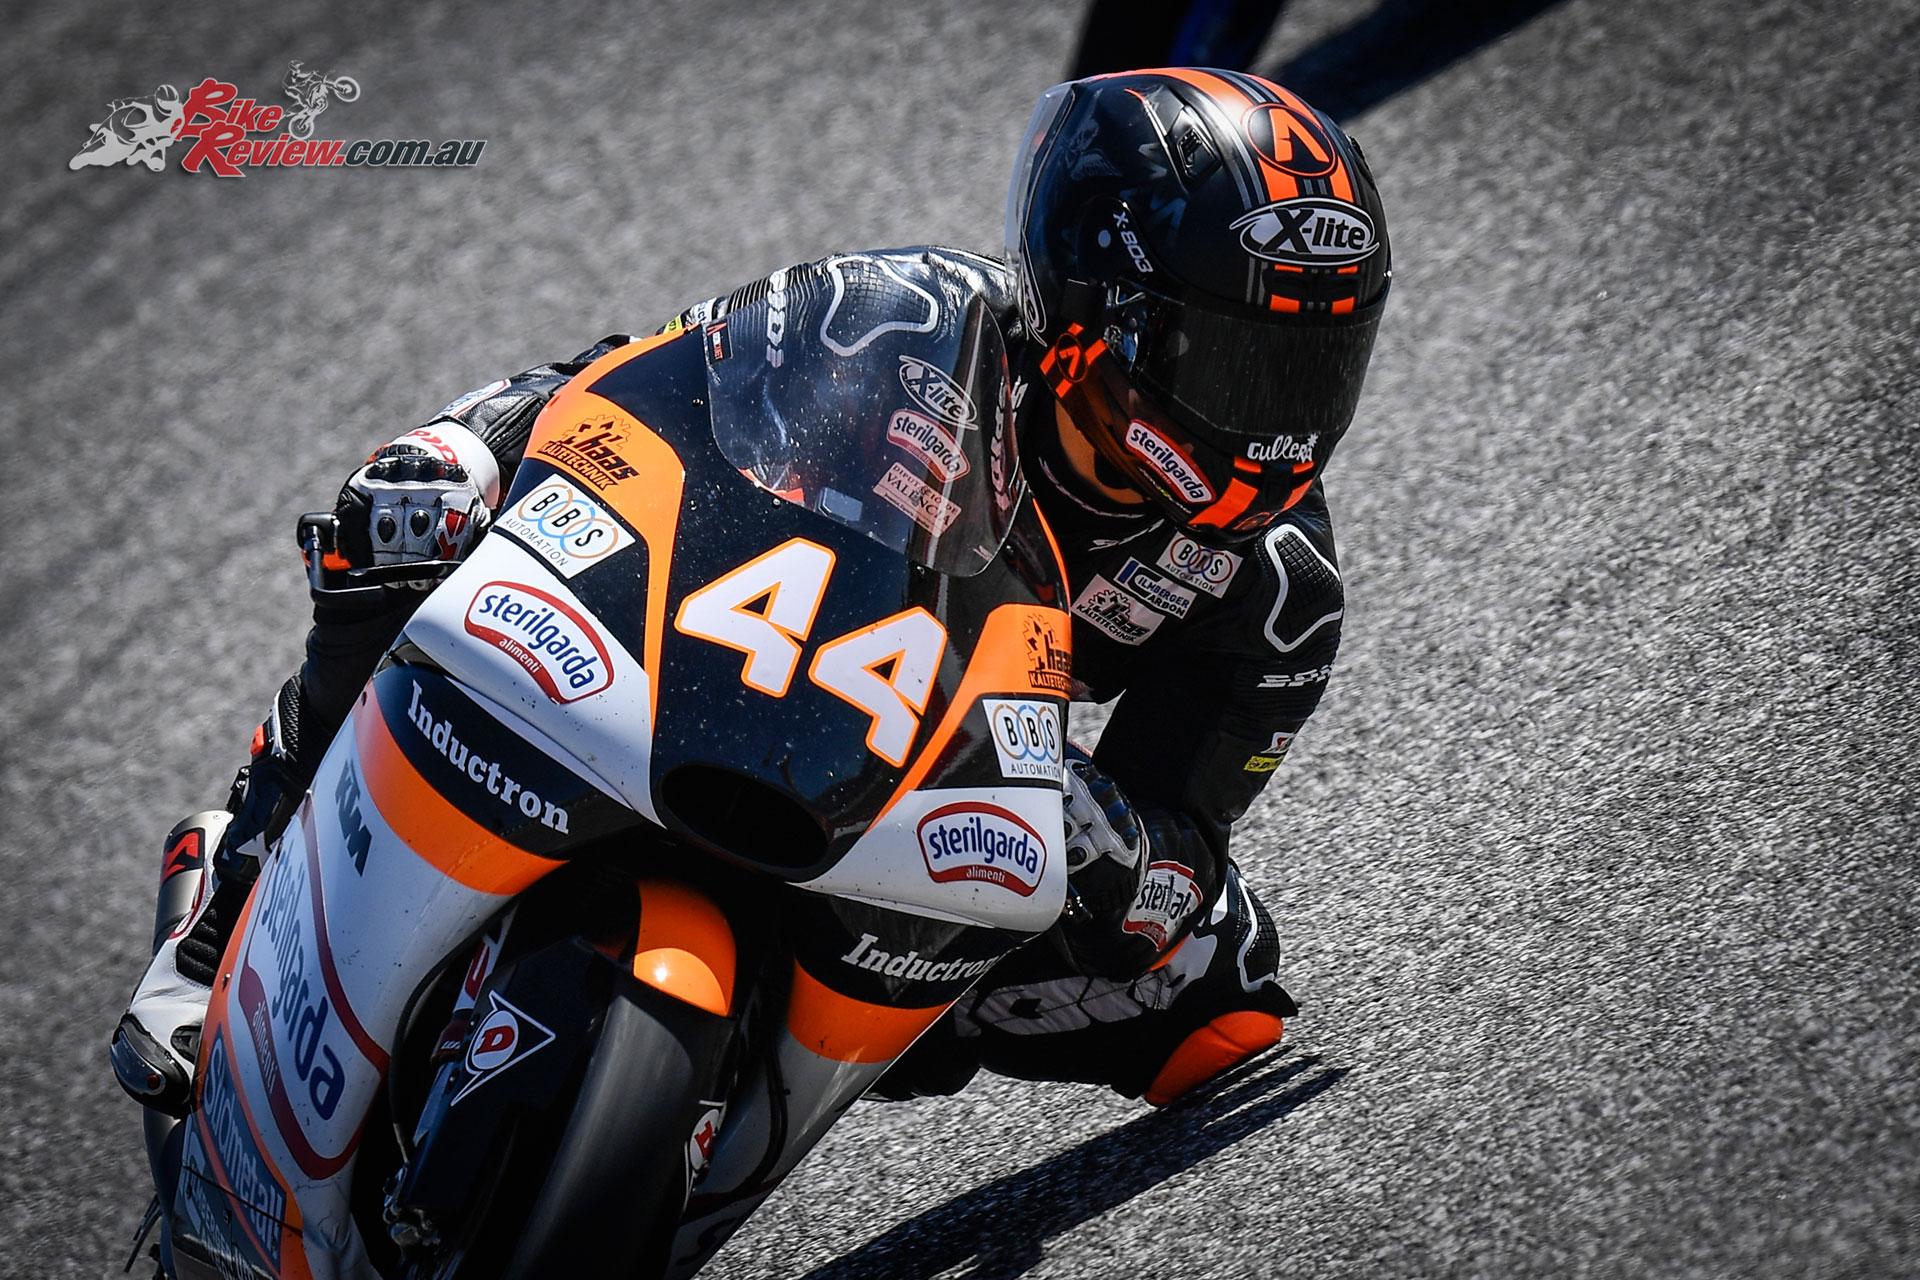 Aron Canet - 2019 MotoGP COTA